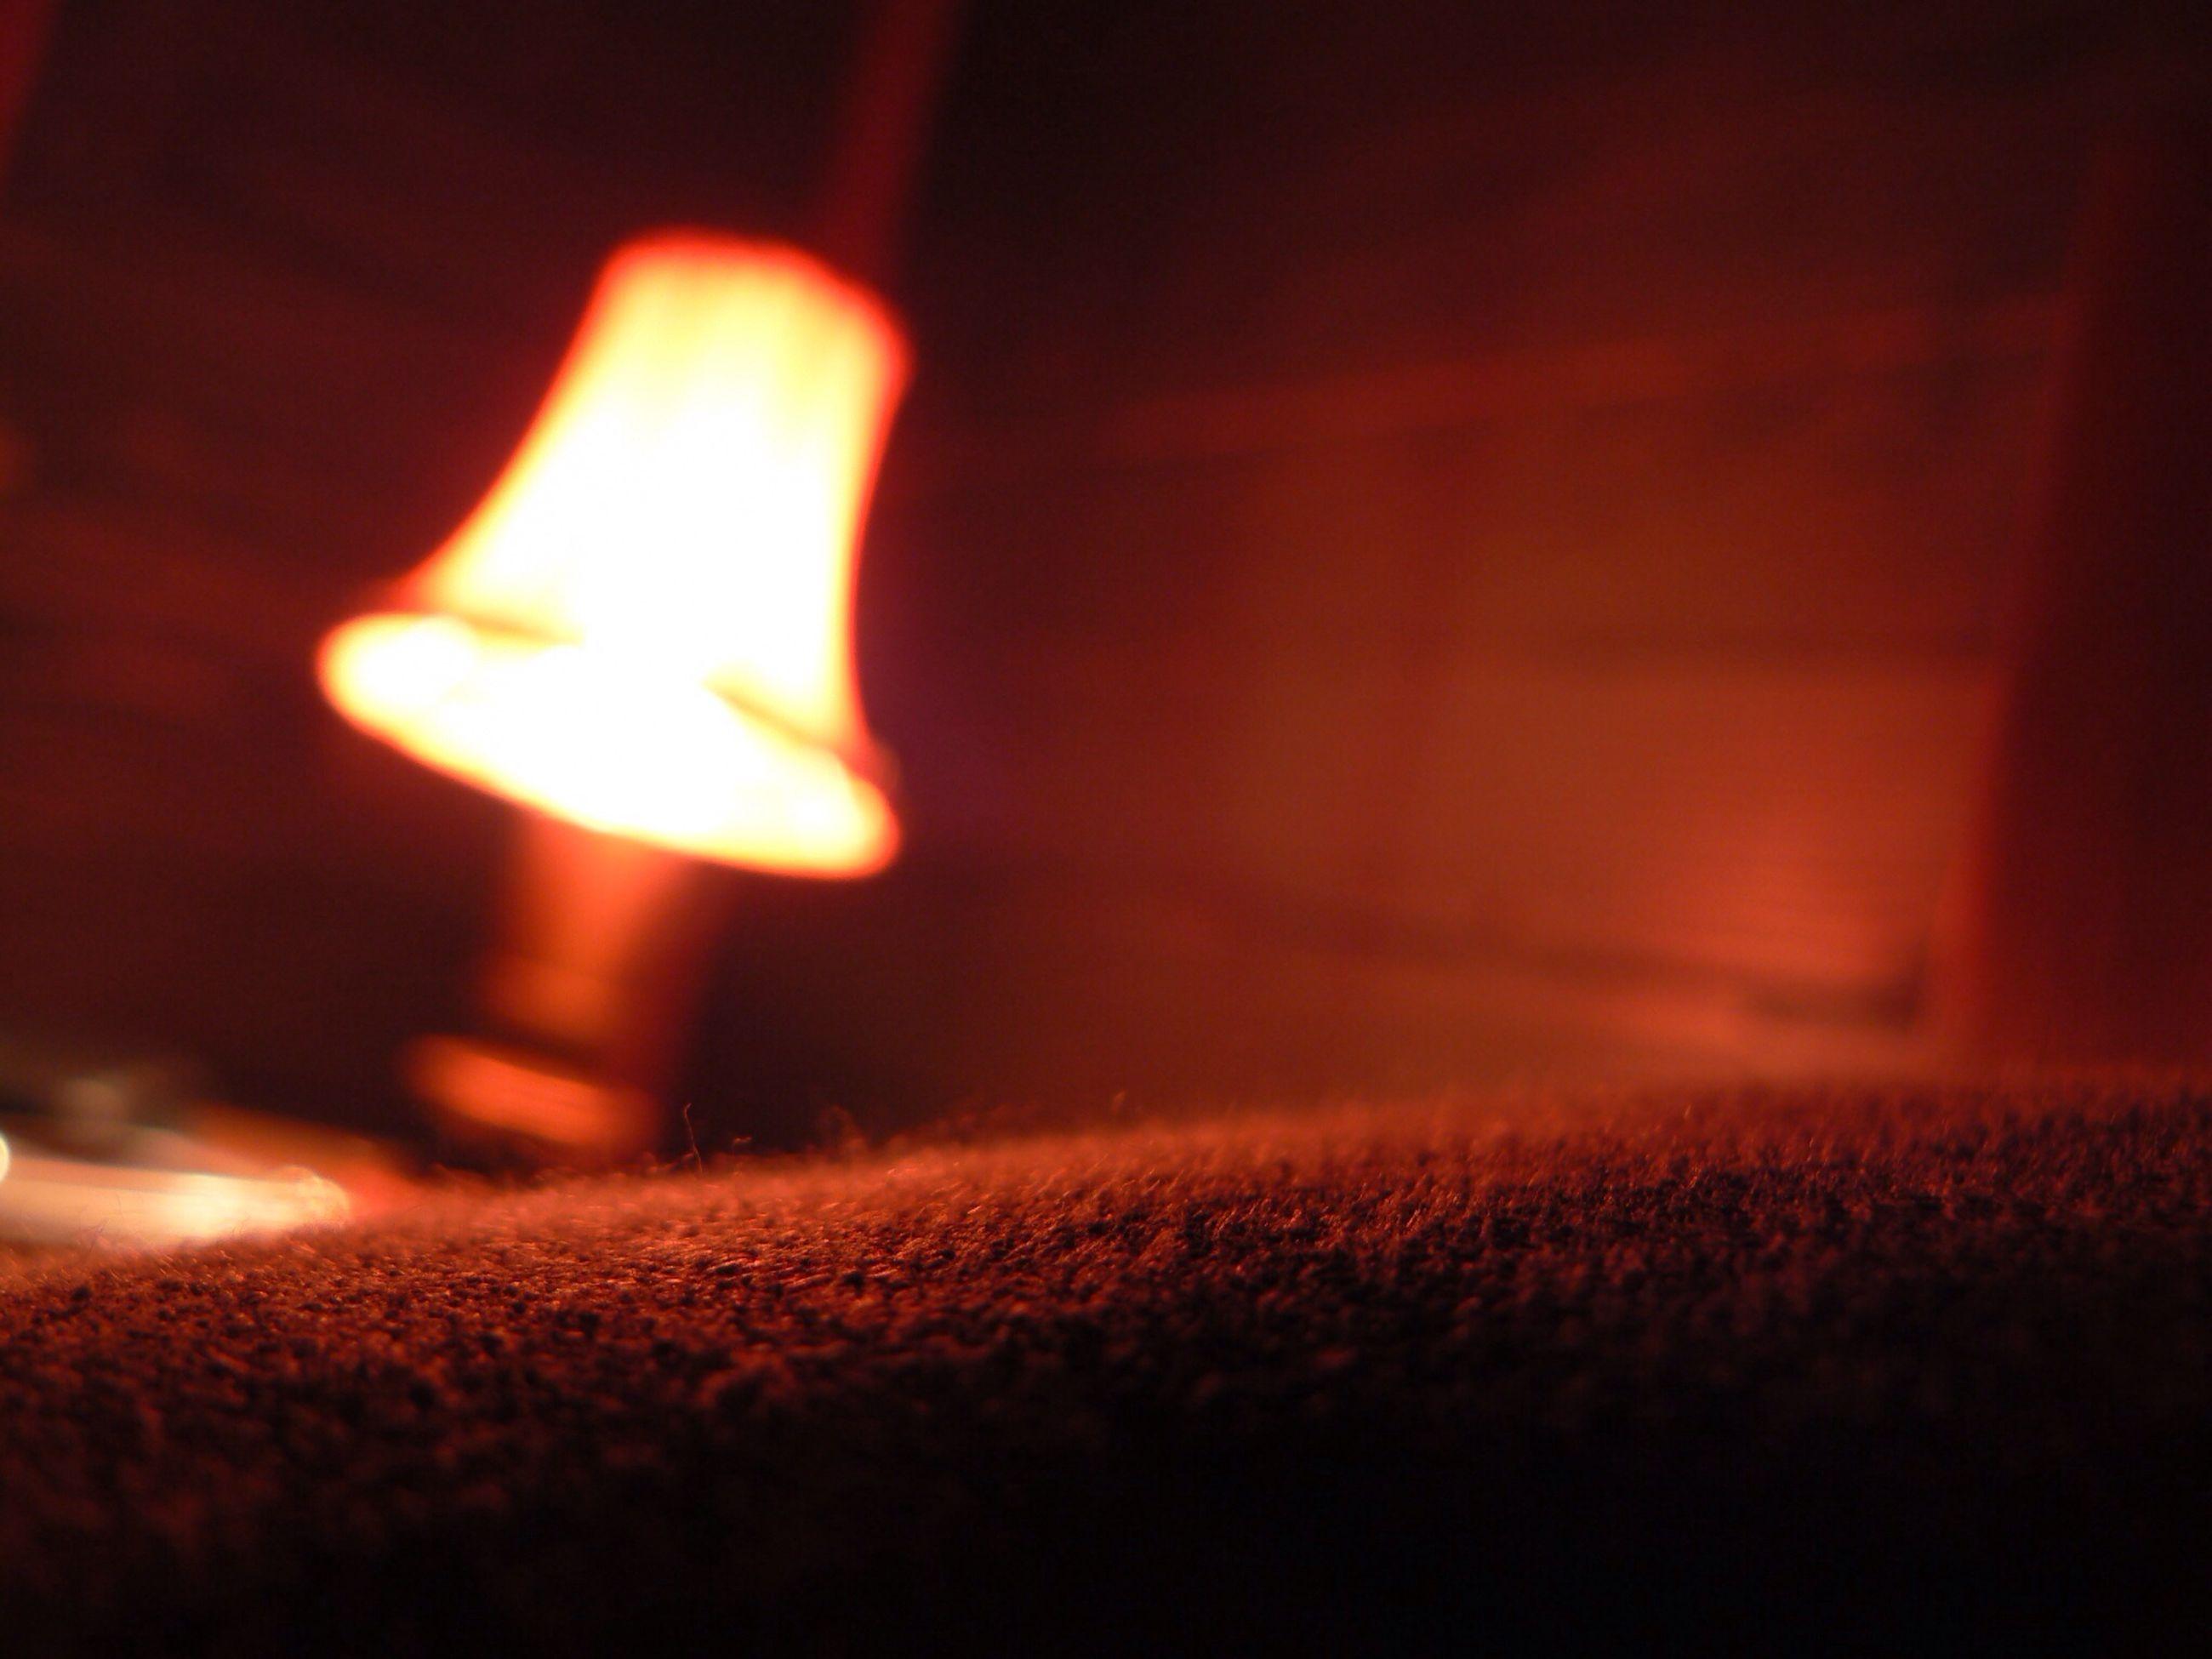 illuminated, flame, burning, night, indoors, fire - natural phenomenon, heat - temperature, glowing, candle, dark, lit, light - natural phenomenon, lighting equipment, fire, darkroom, close-up, light, selective focus